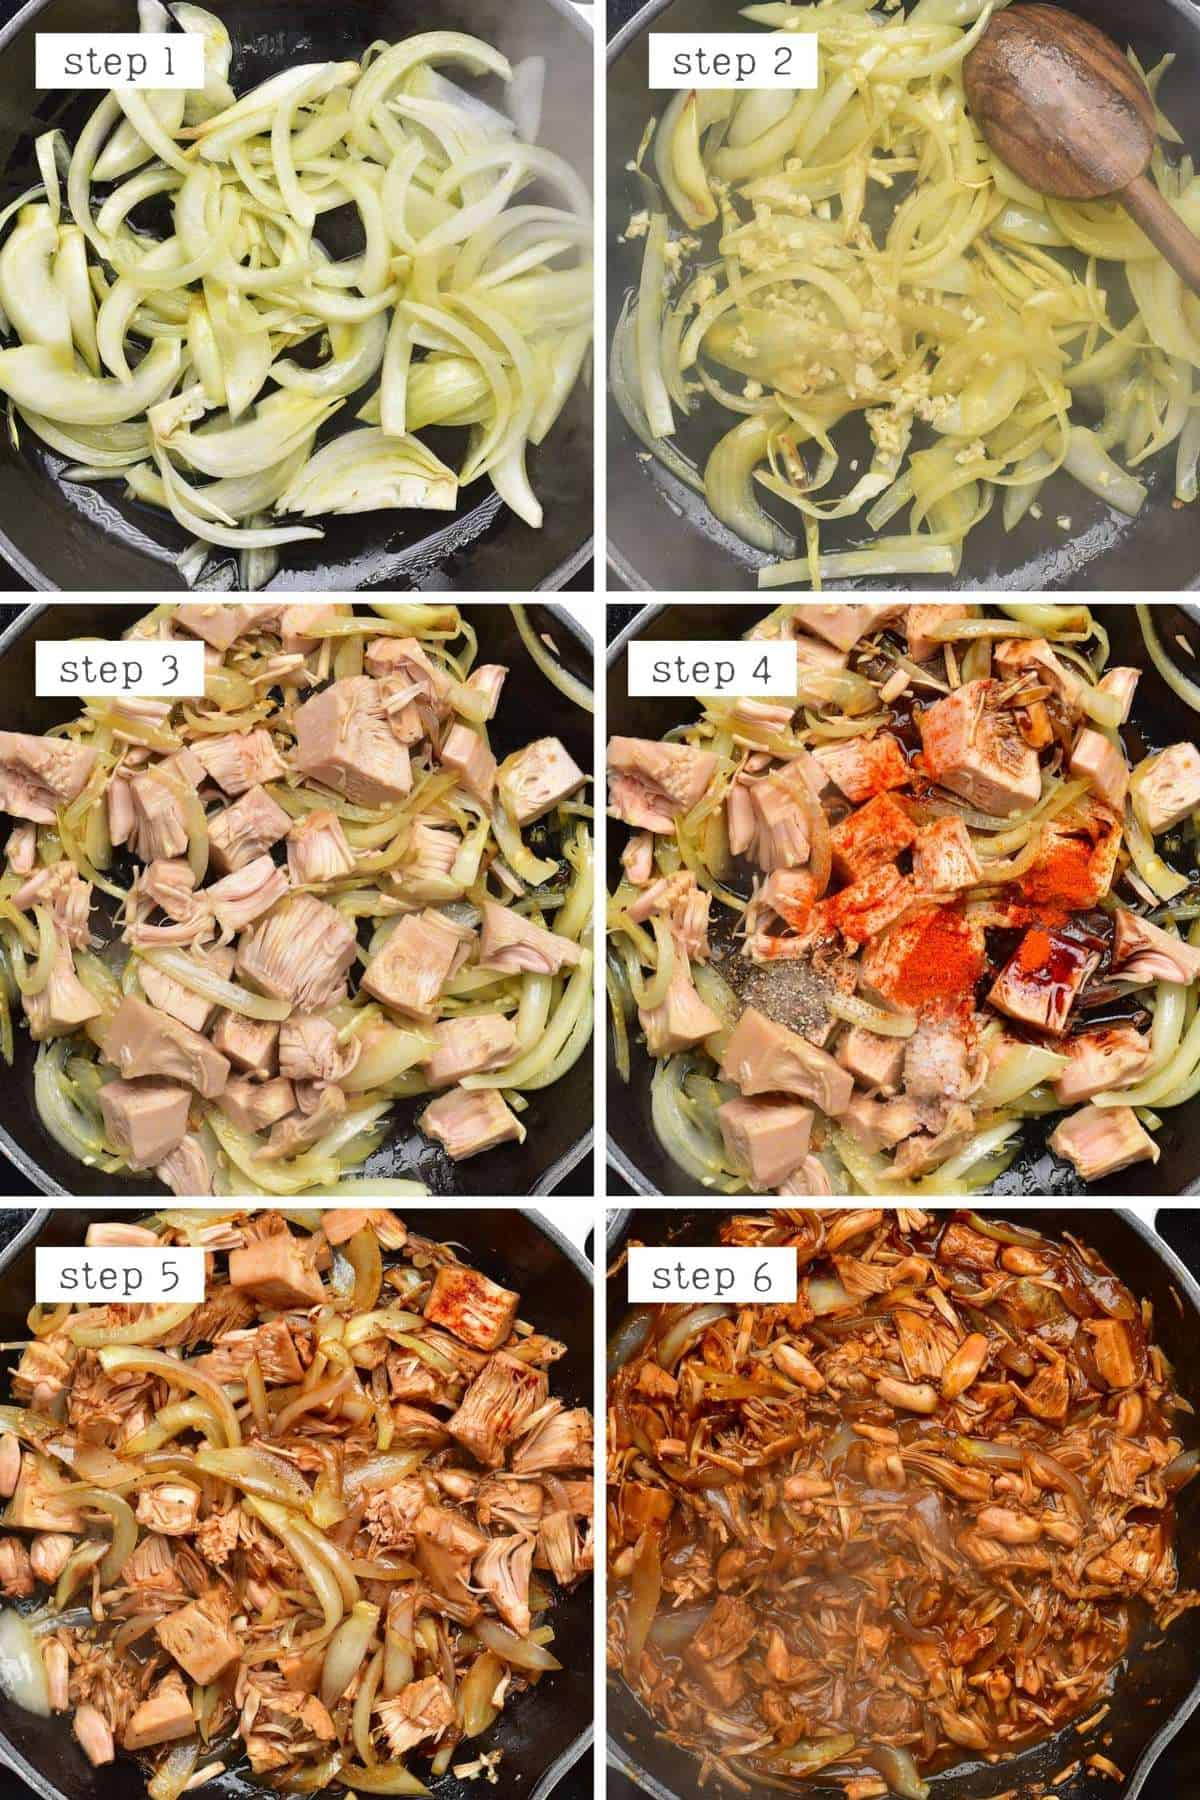 Steps for cooking BBQ jackfruit